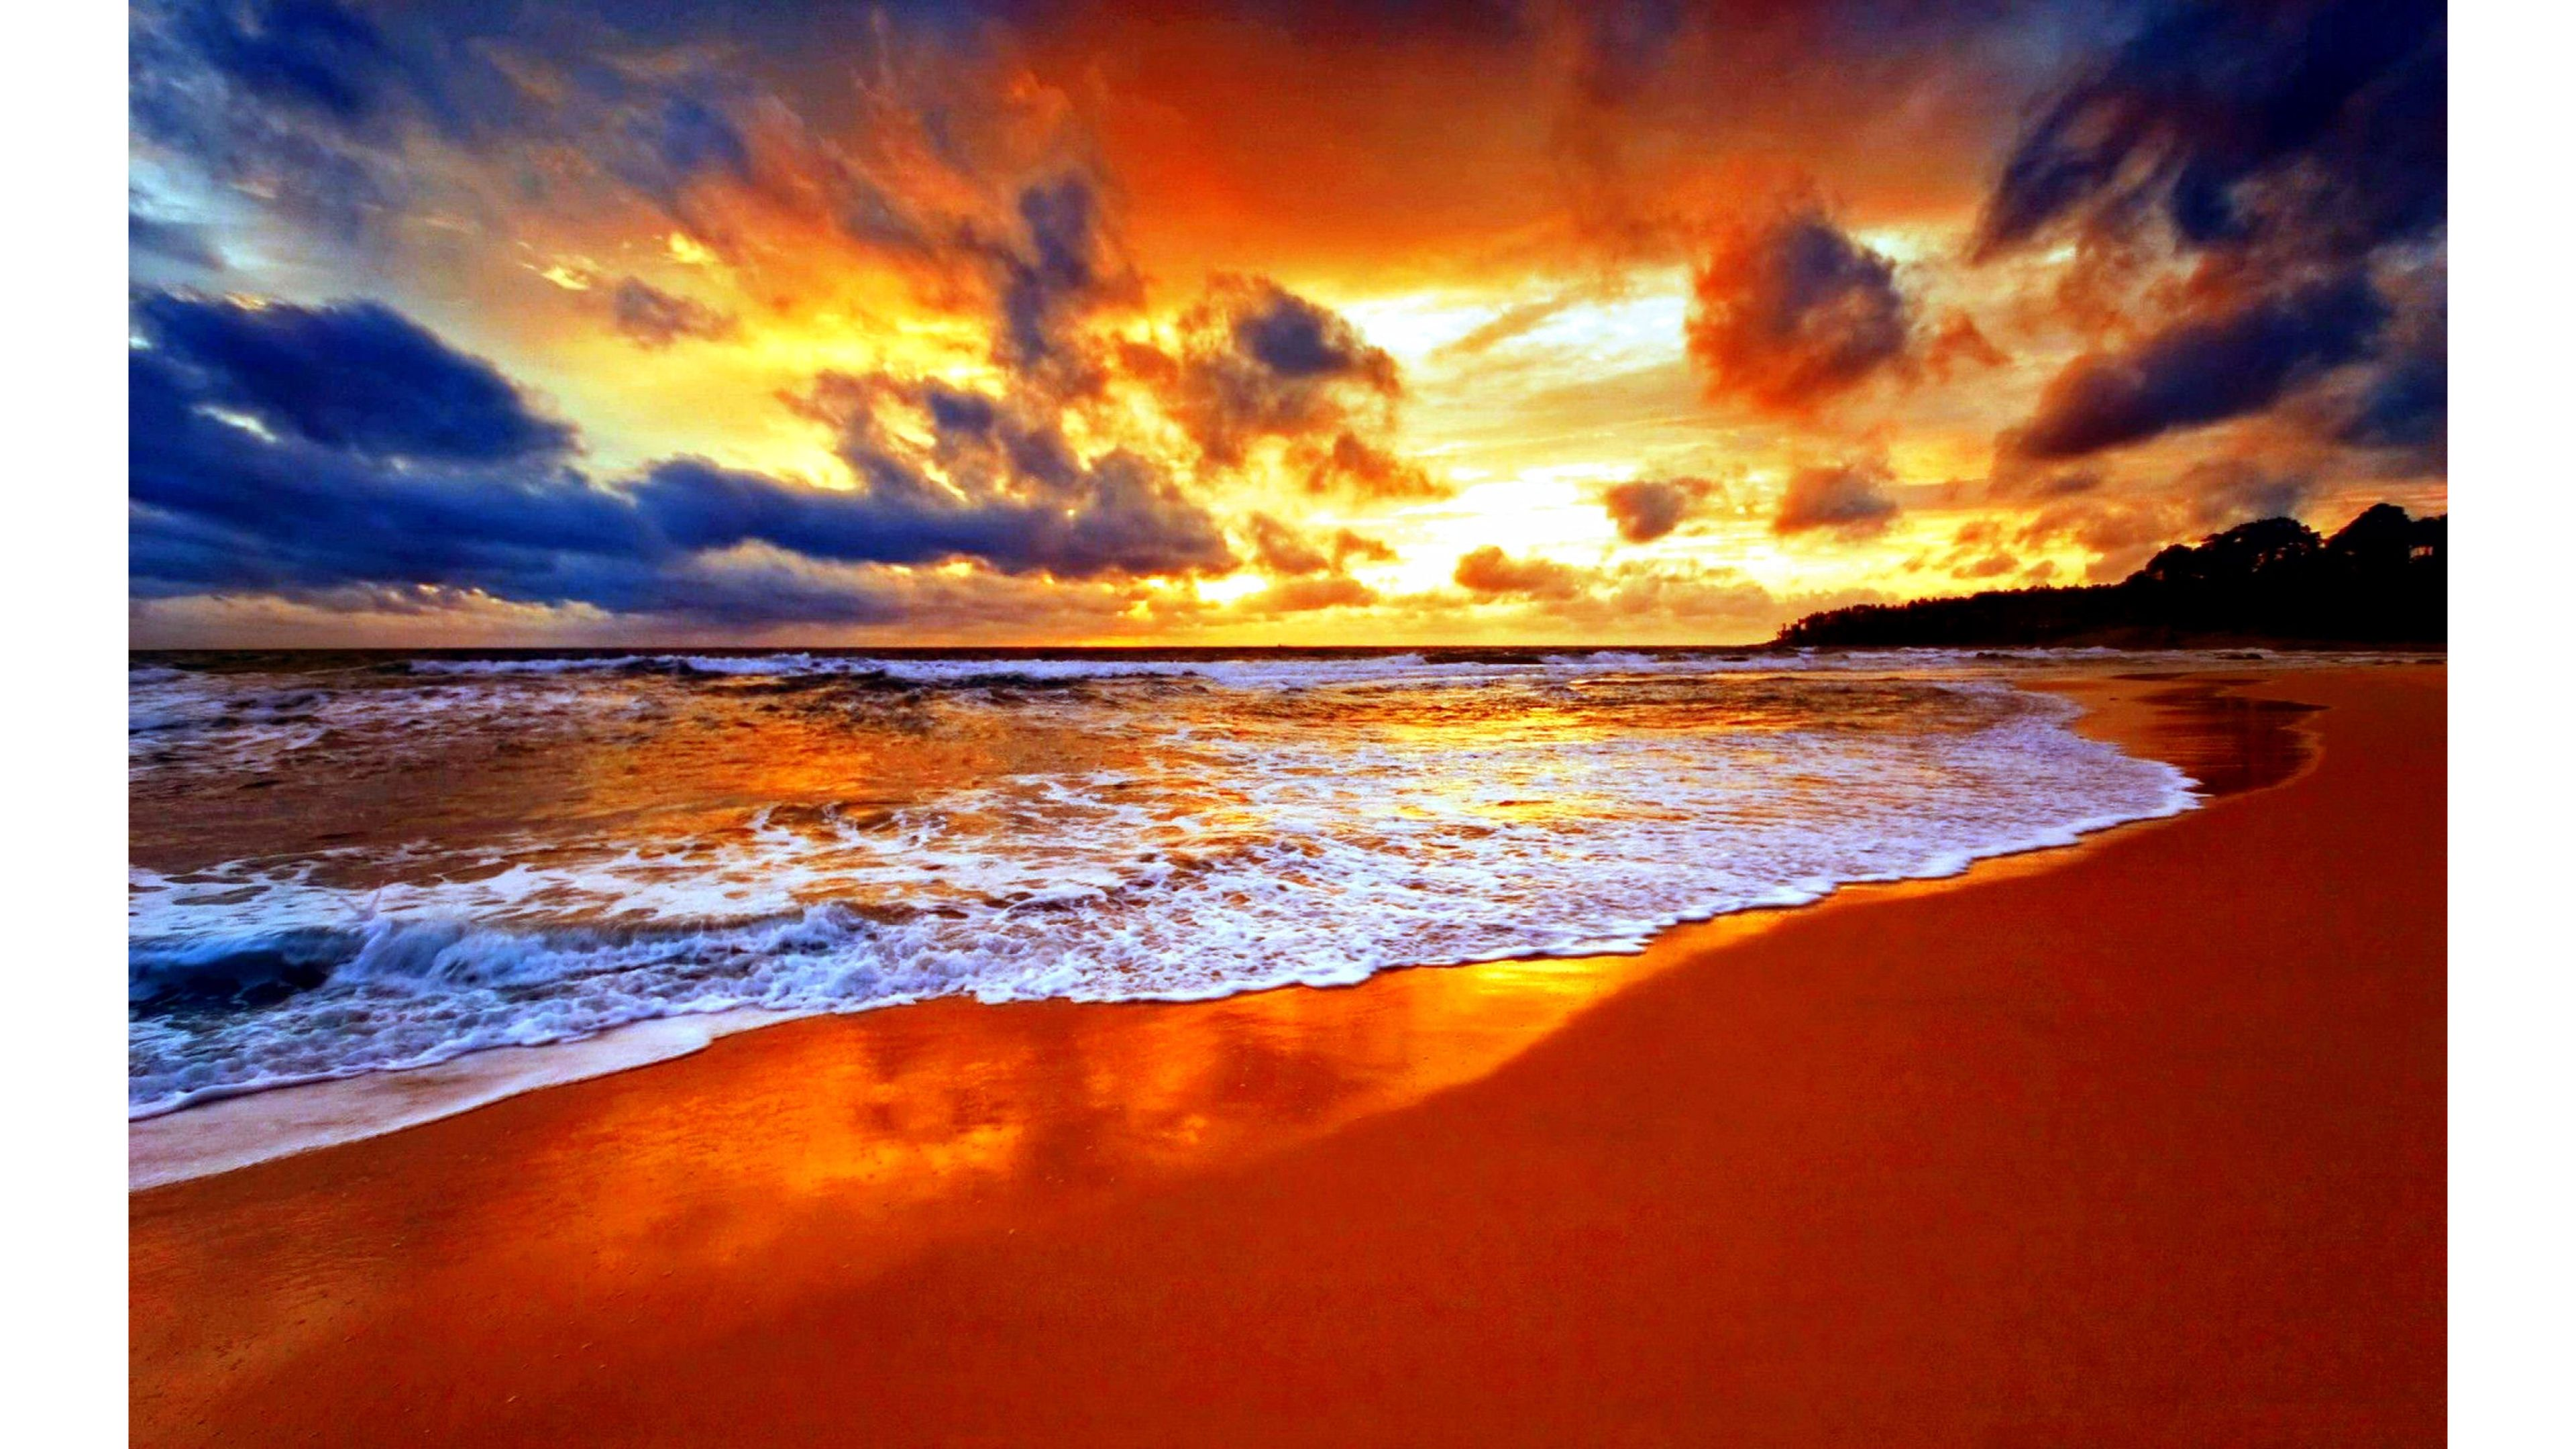 Free Download Top Sunset 4k Wallpaper 4k Wallpaper